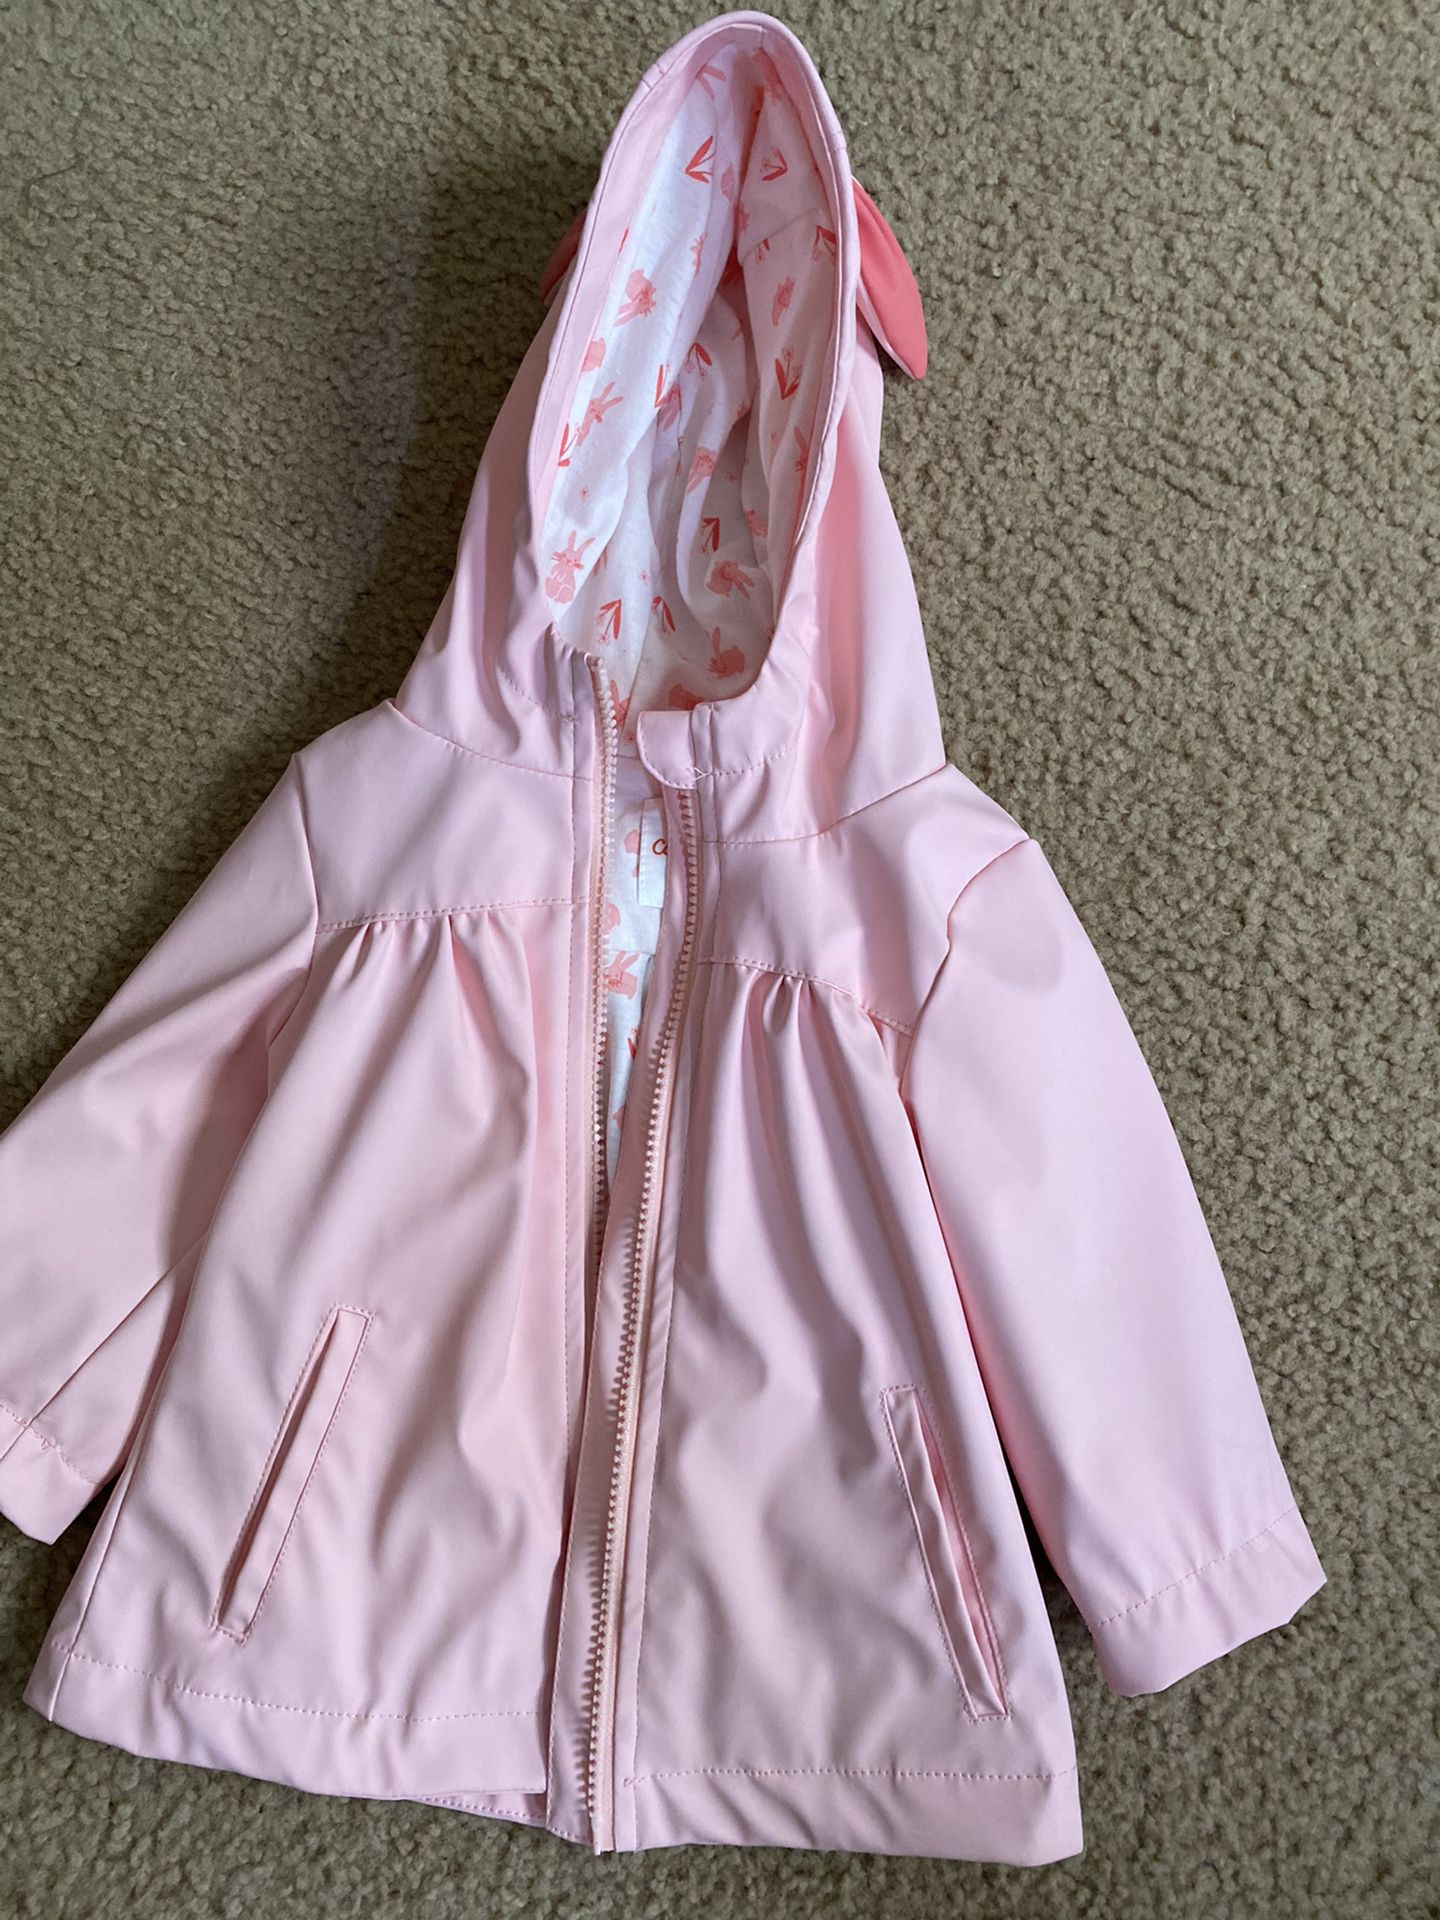 Barely Used Toddler Raincoat